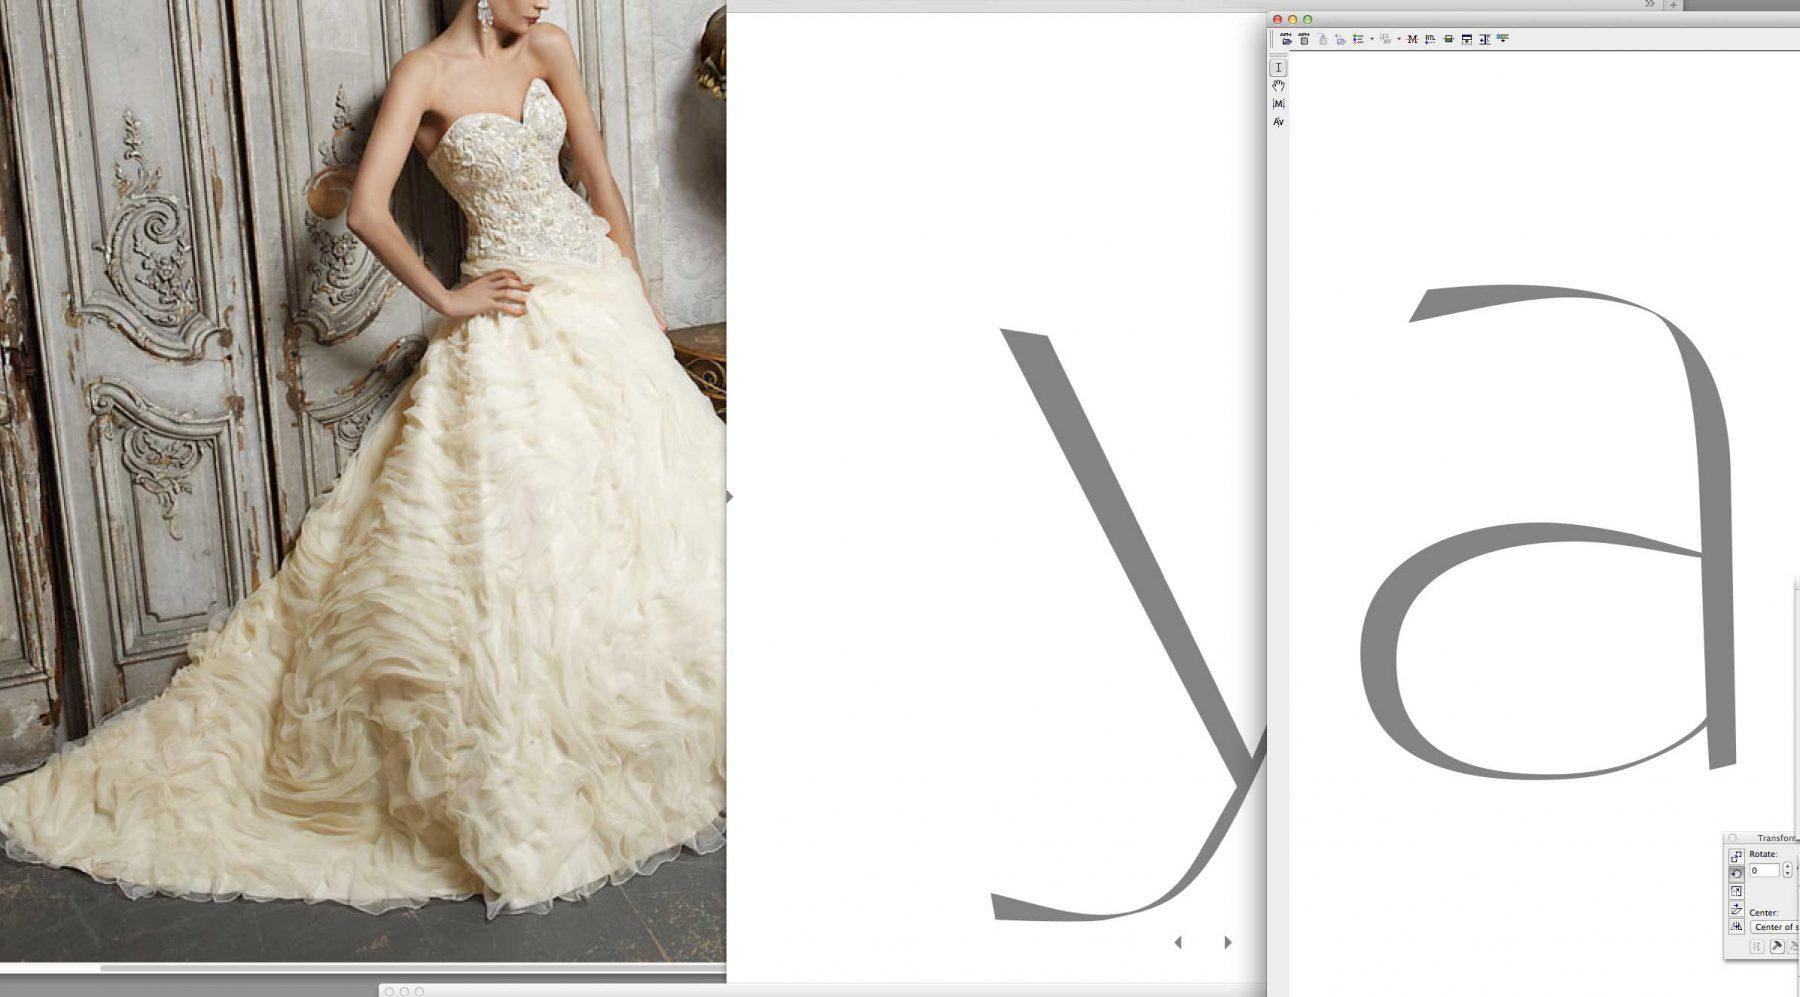 Dior wedding dress · Reflection Process Sketches 'ya'